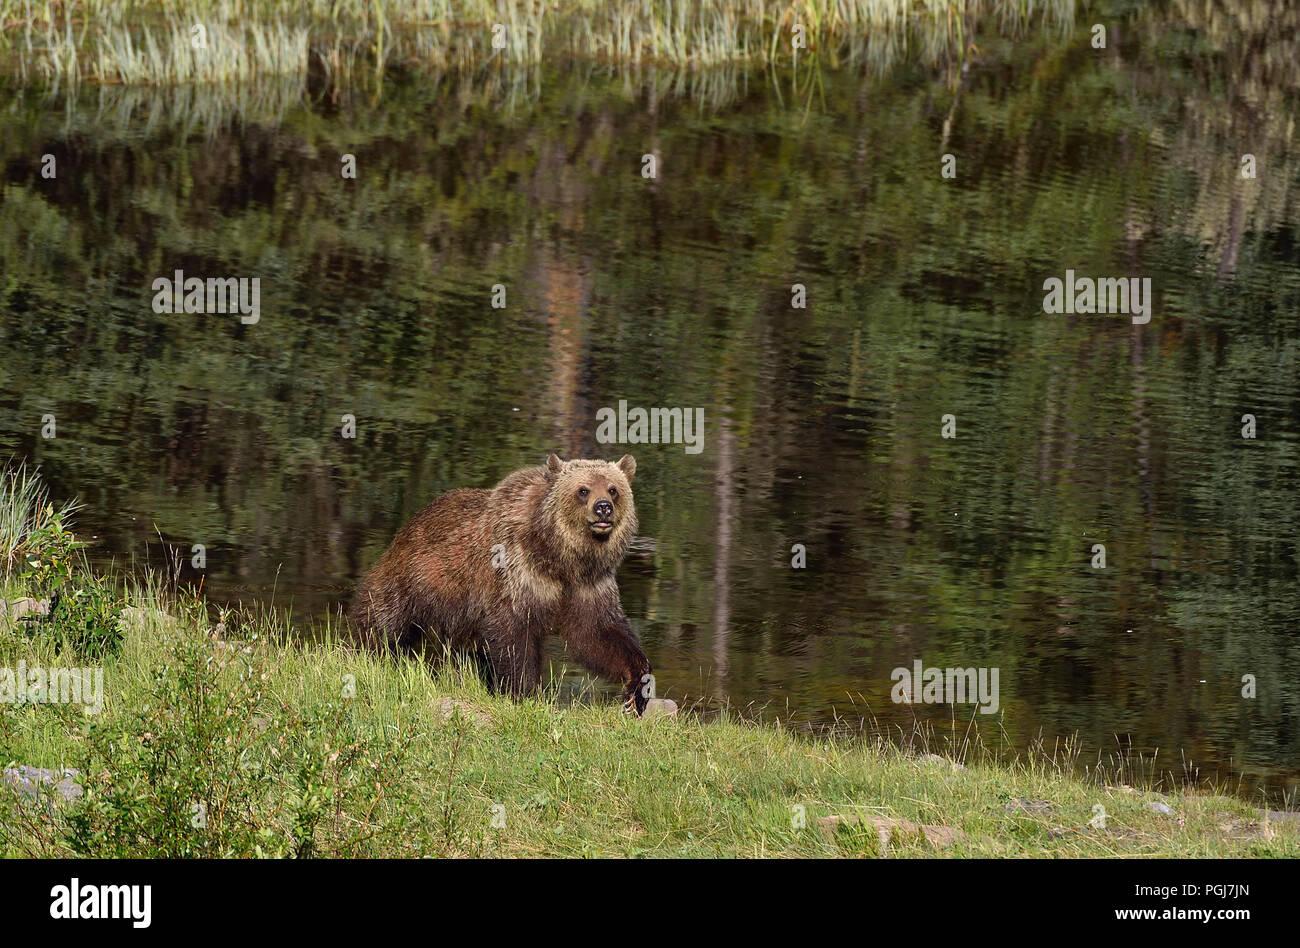 A grizzly bear  (Ursus arctos); walking along a lake shore in rural Alberta Canada. - Stock Image